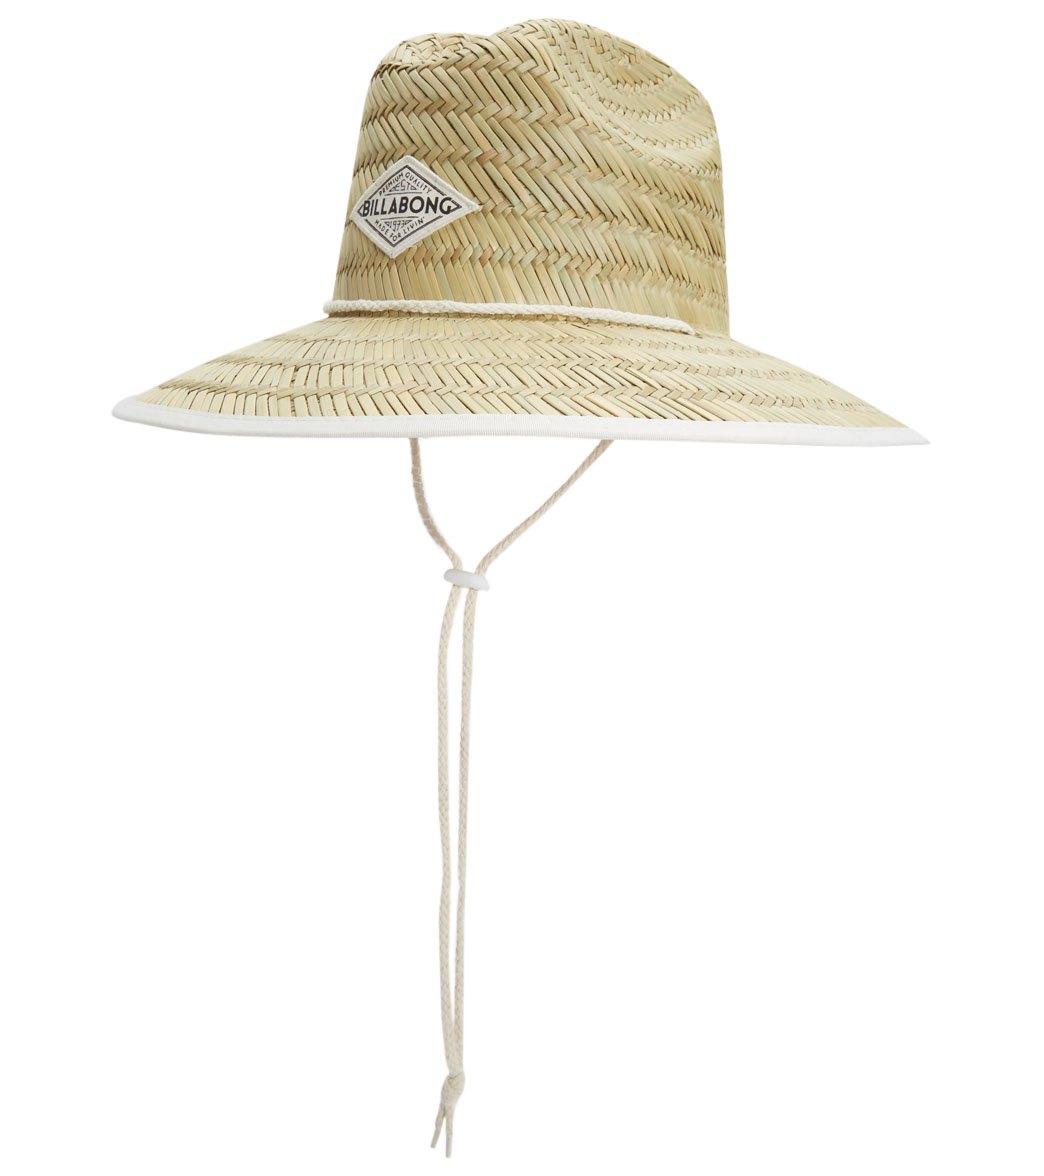 53c3a045c0505 Billabong Tipton Hat at SwimOutlet.com